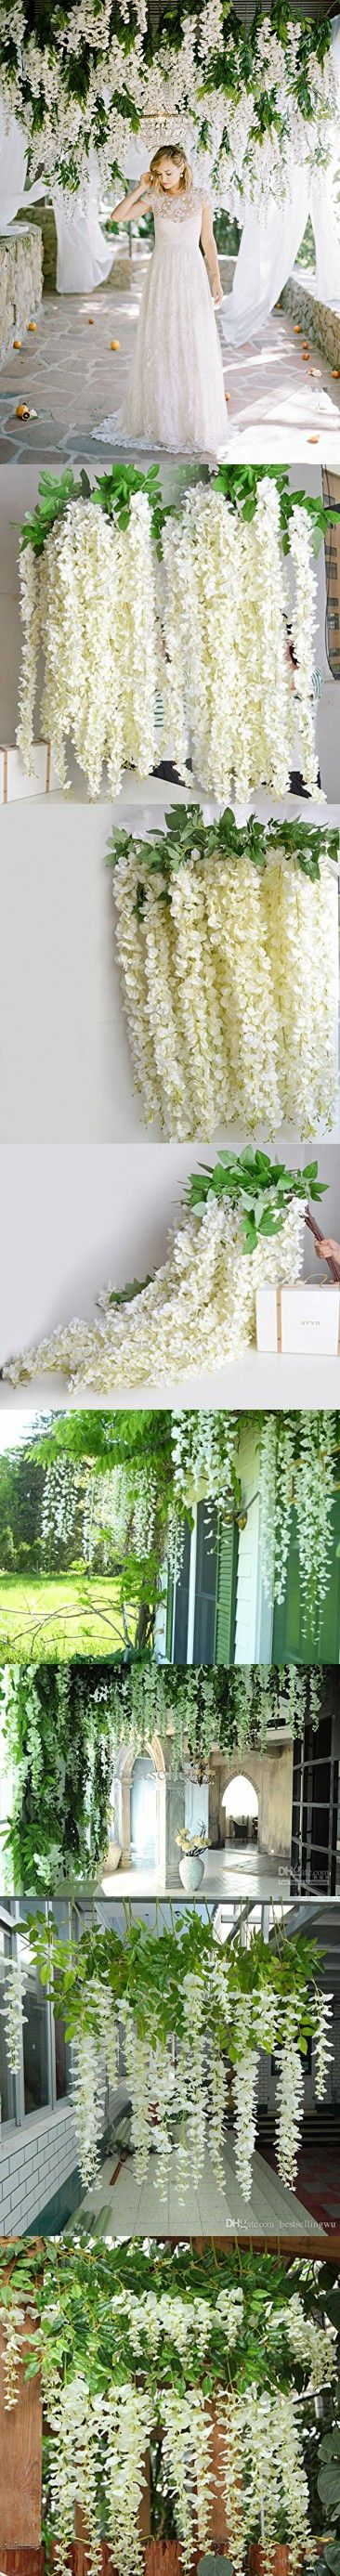 best wedding decor images on pinterest wedding ideas weddings